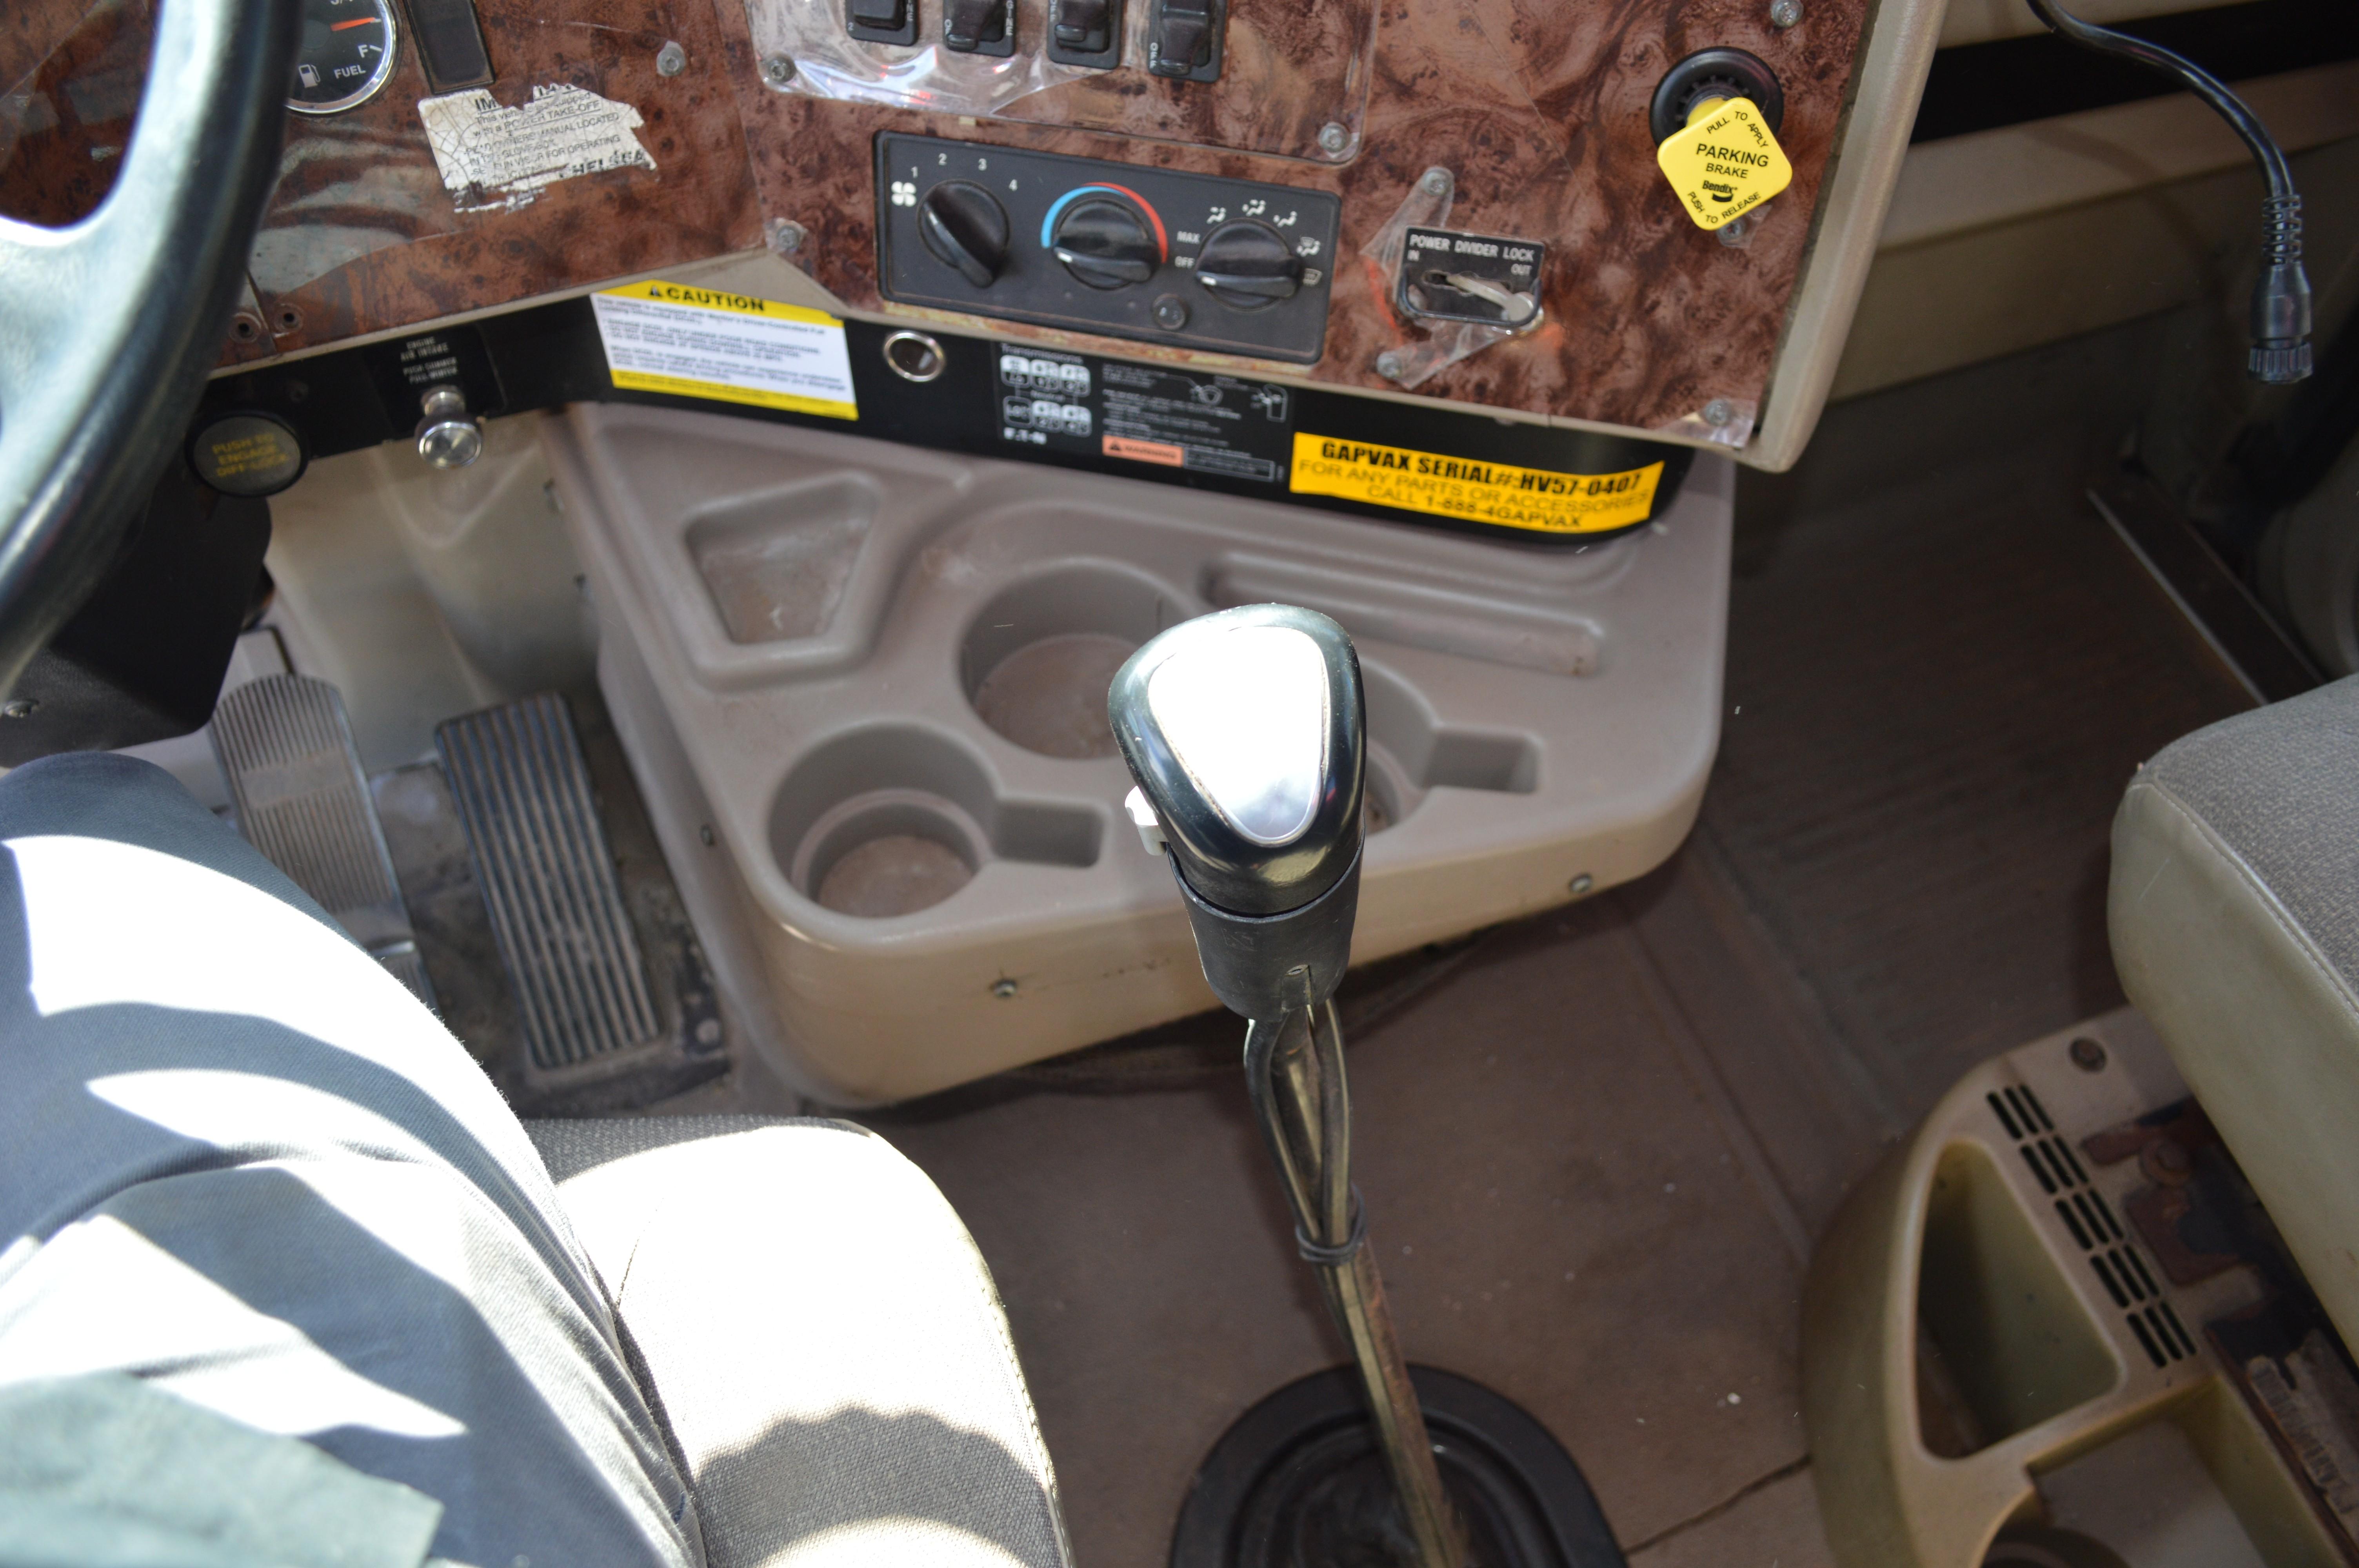 Used 2005 International 5600i Gapvax HV-56 - INDUSTRIAL AIR